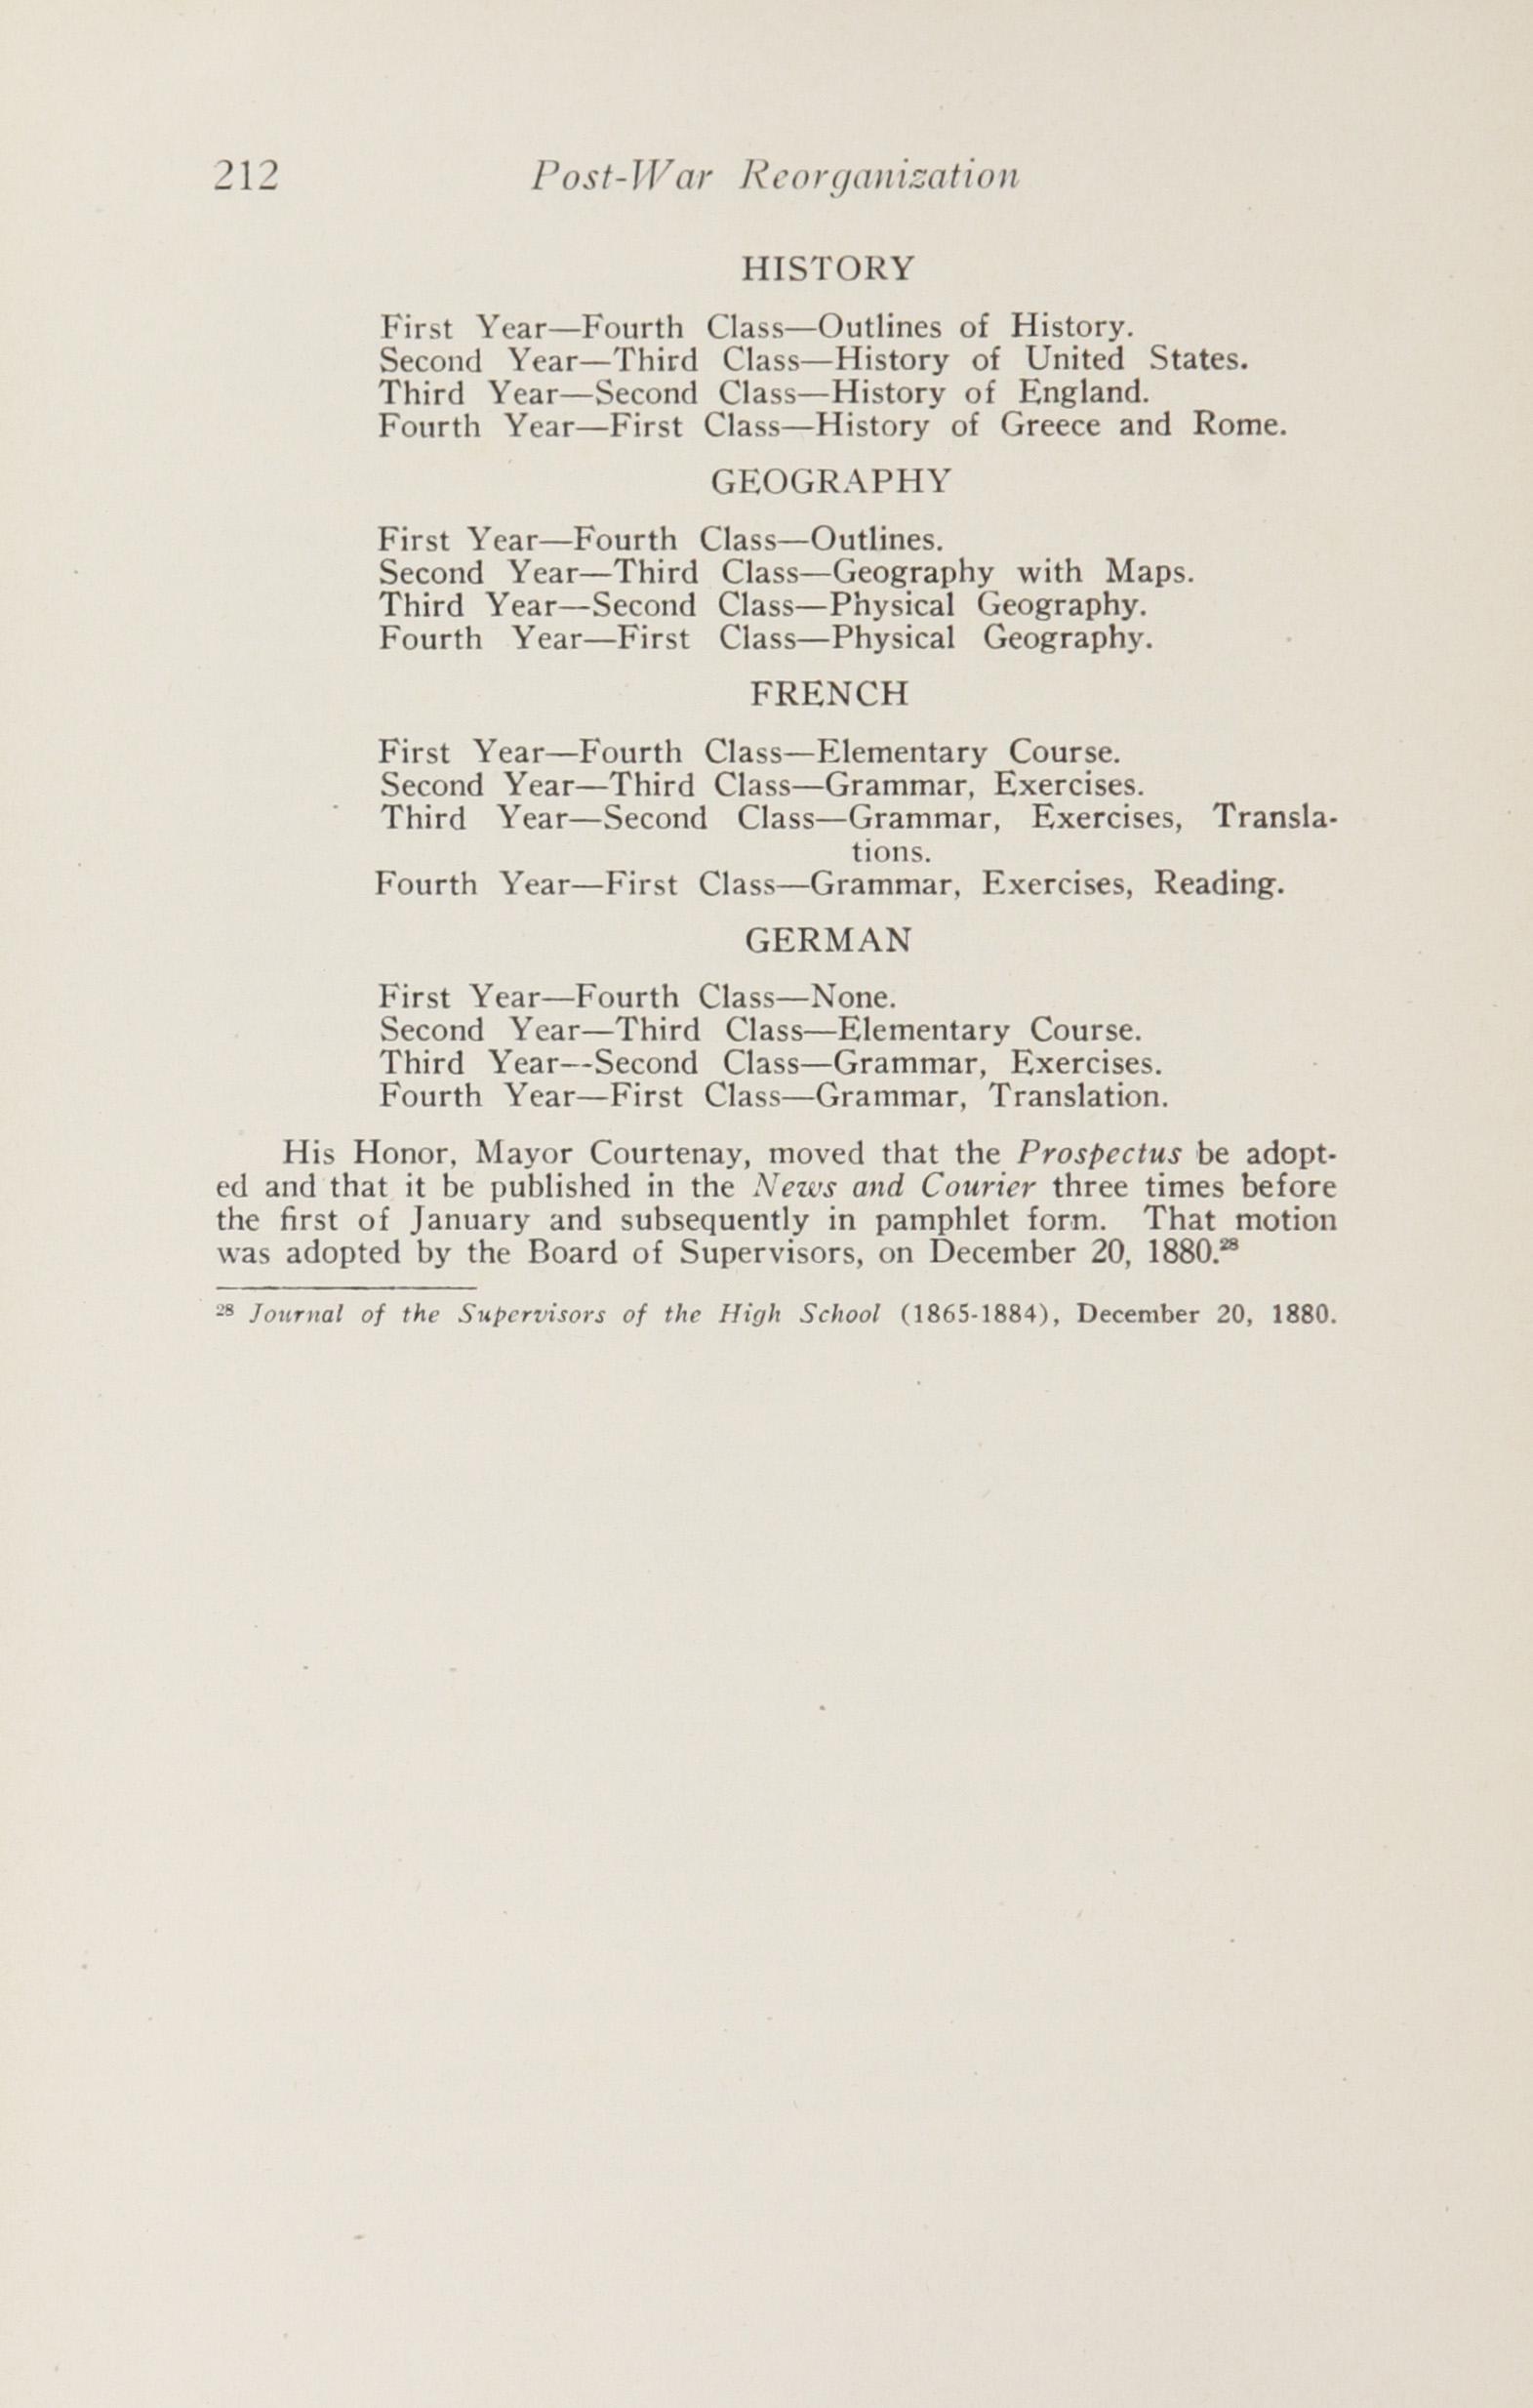 Charleston Yearbook, 1943, page 212